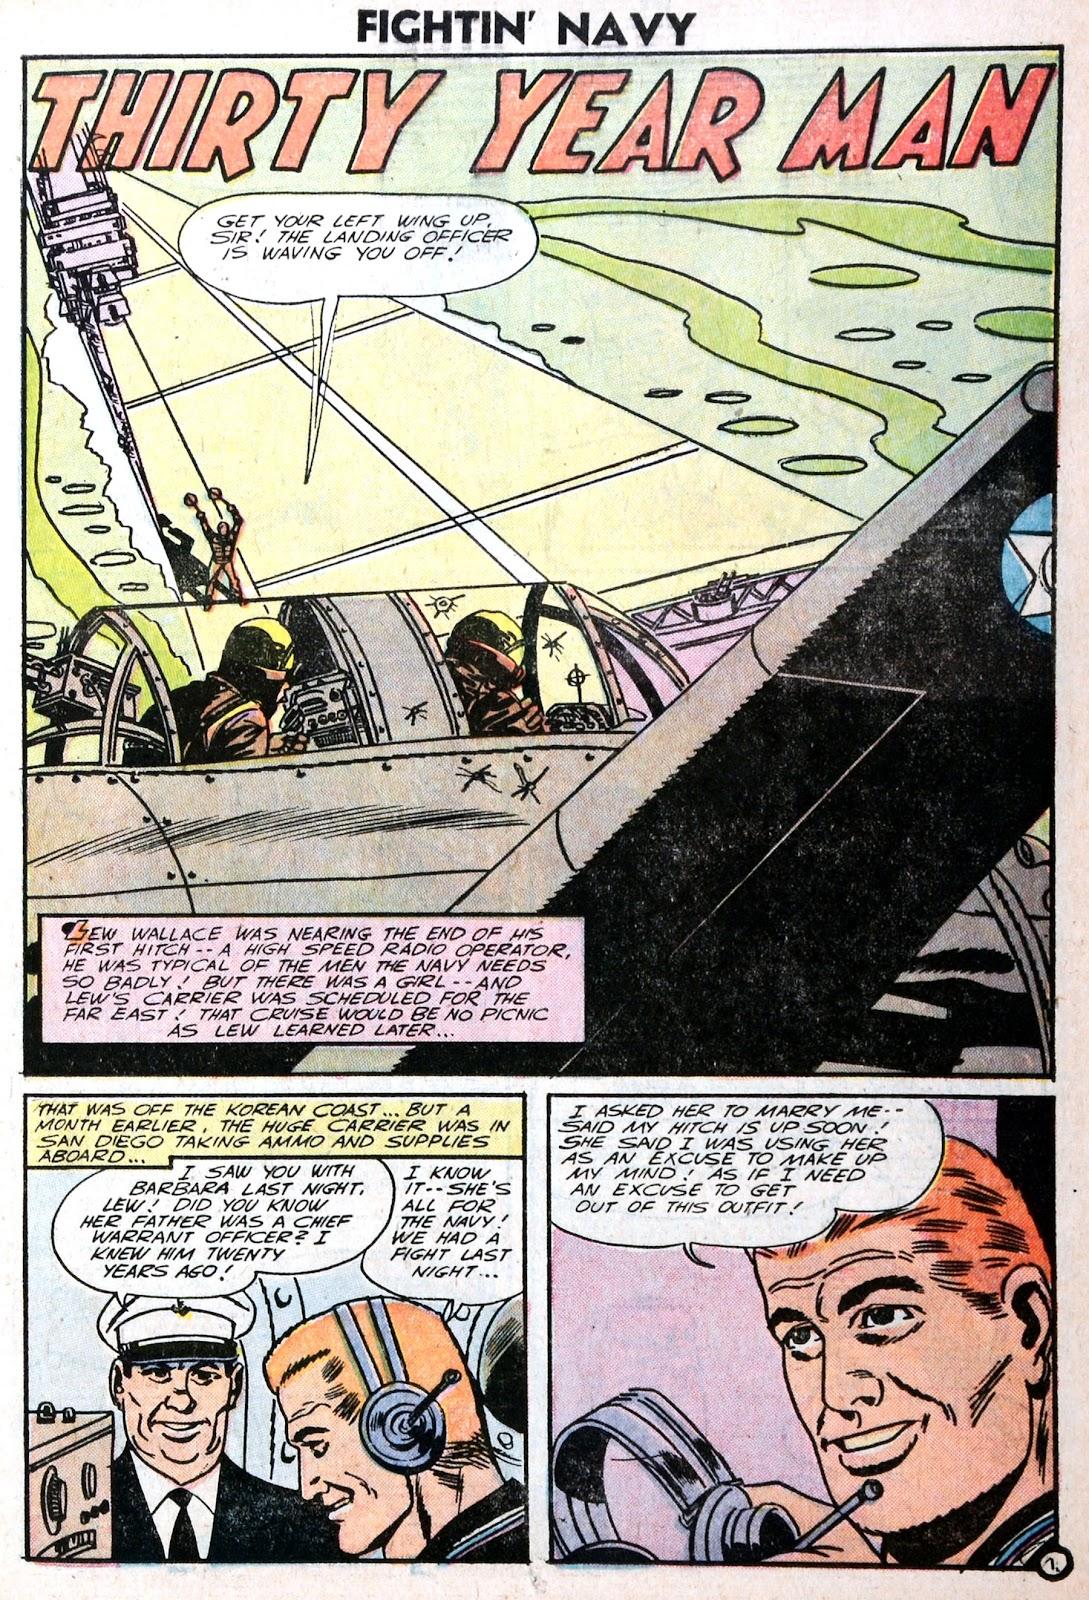 Read online Fightin' Navy comic -  Issue #75 - 11